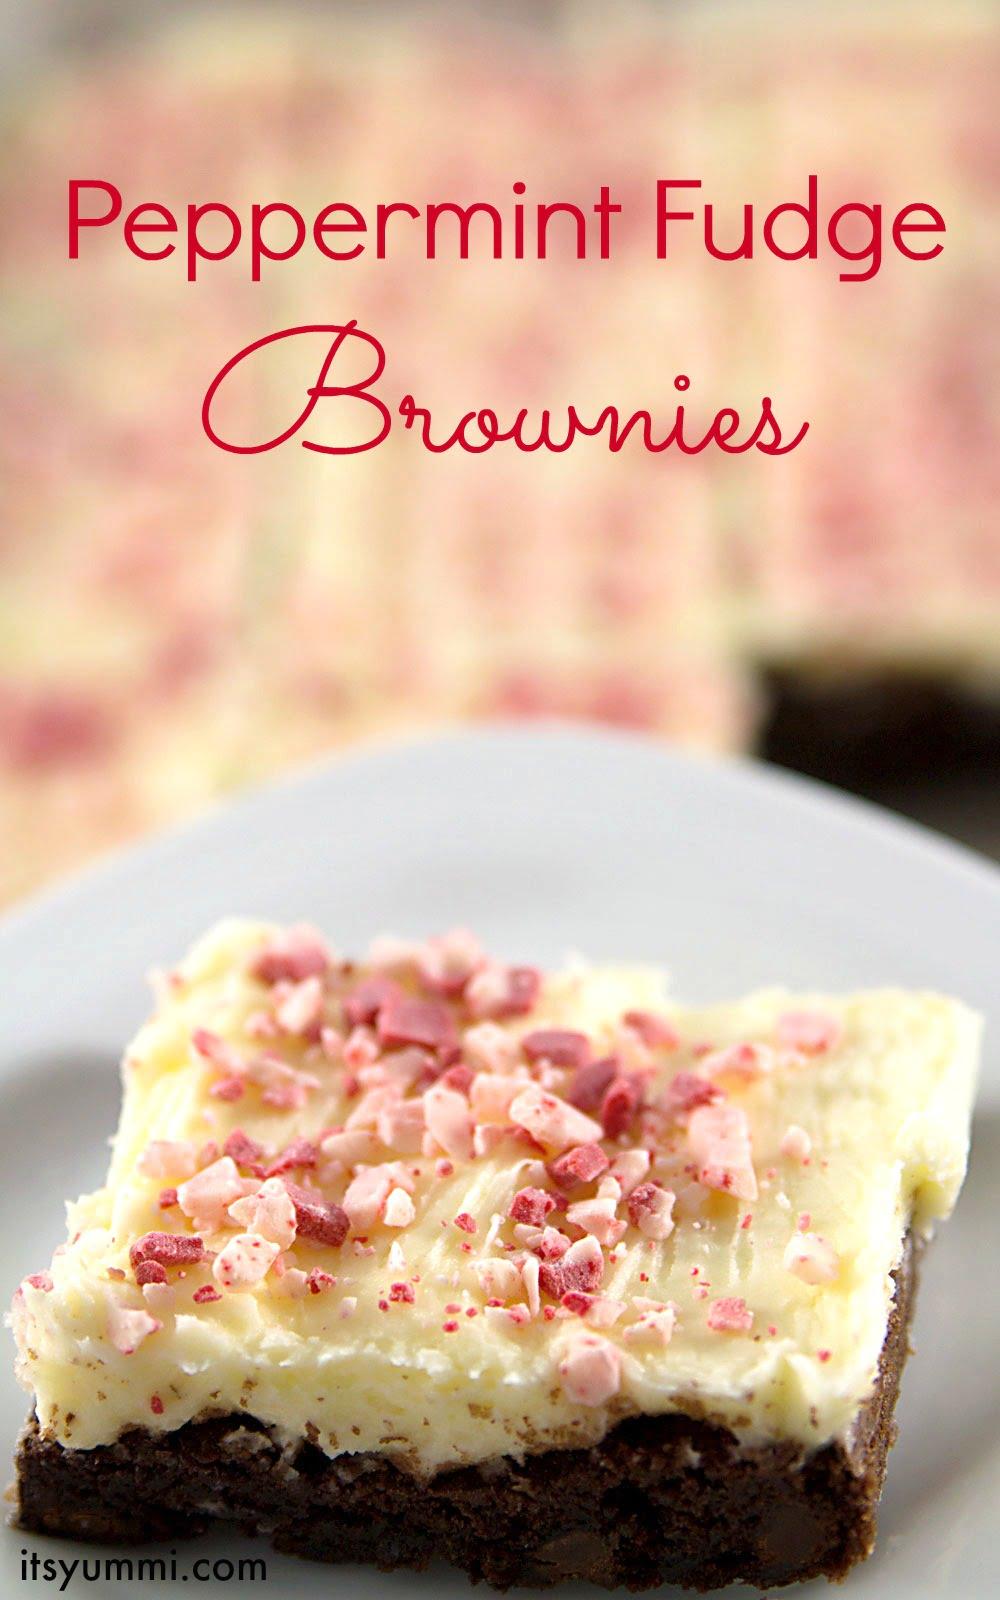 Peppermint Fudge Brownies Recipe, from ItsYummi.com